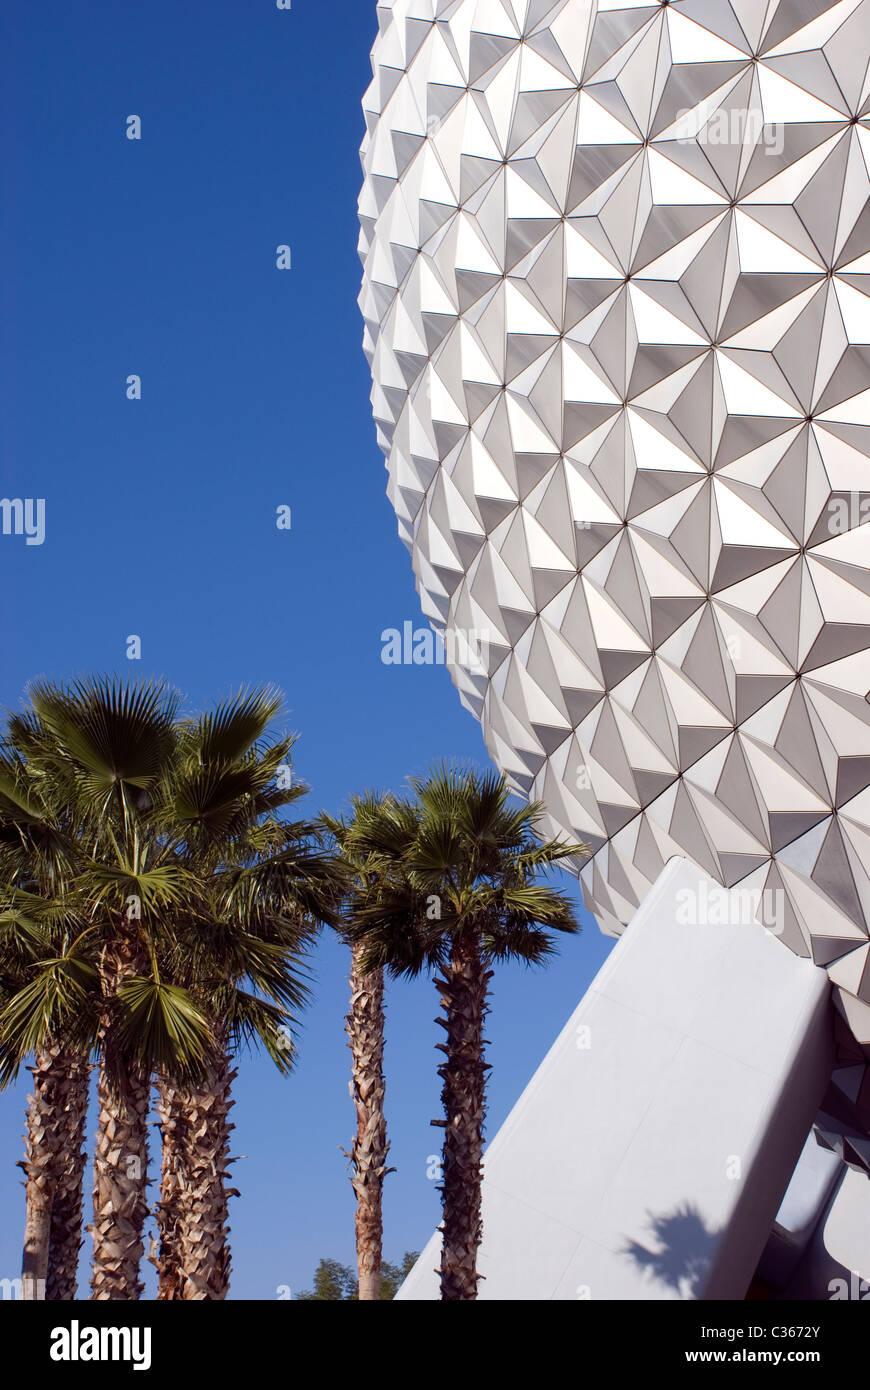 Epcot Center, Walt Disney World Resort, Orlando, Florida Stock Photo